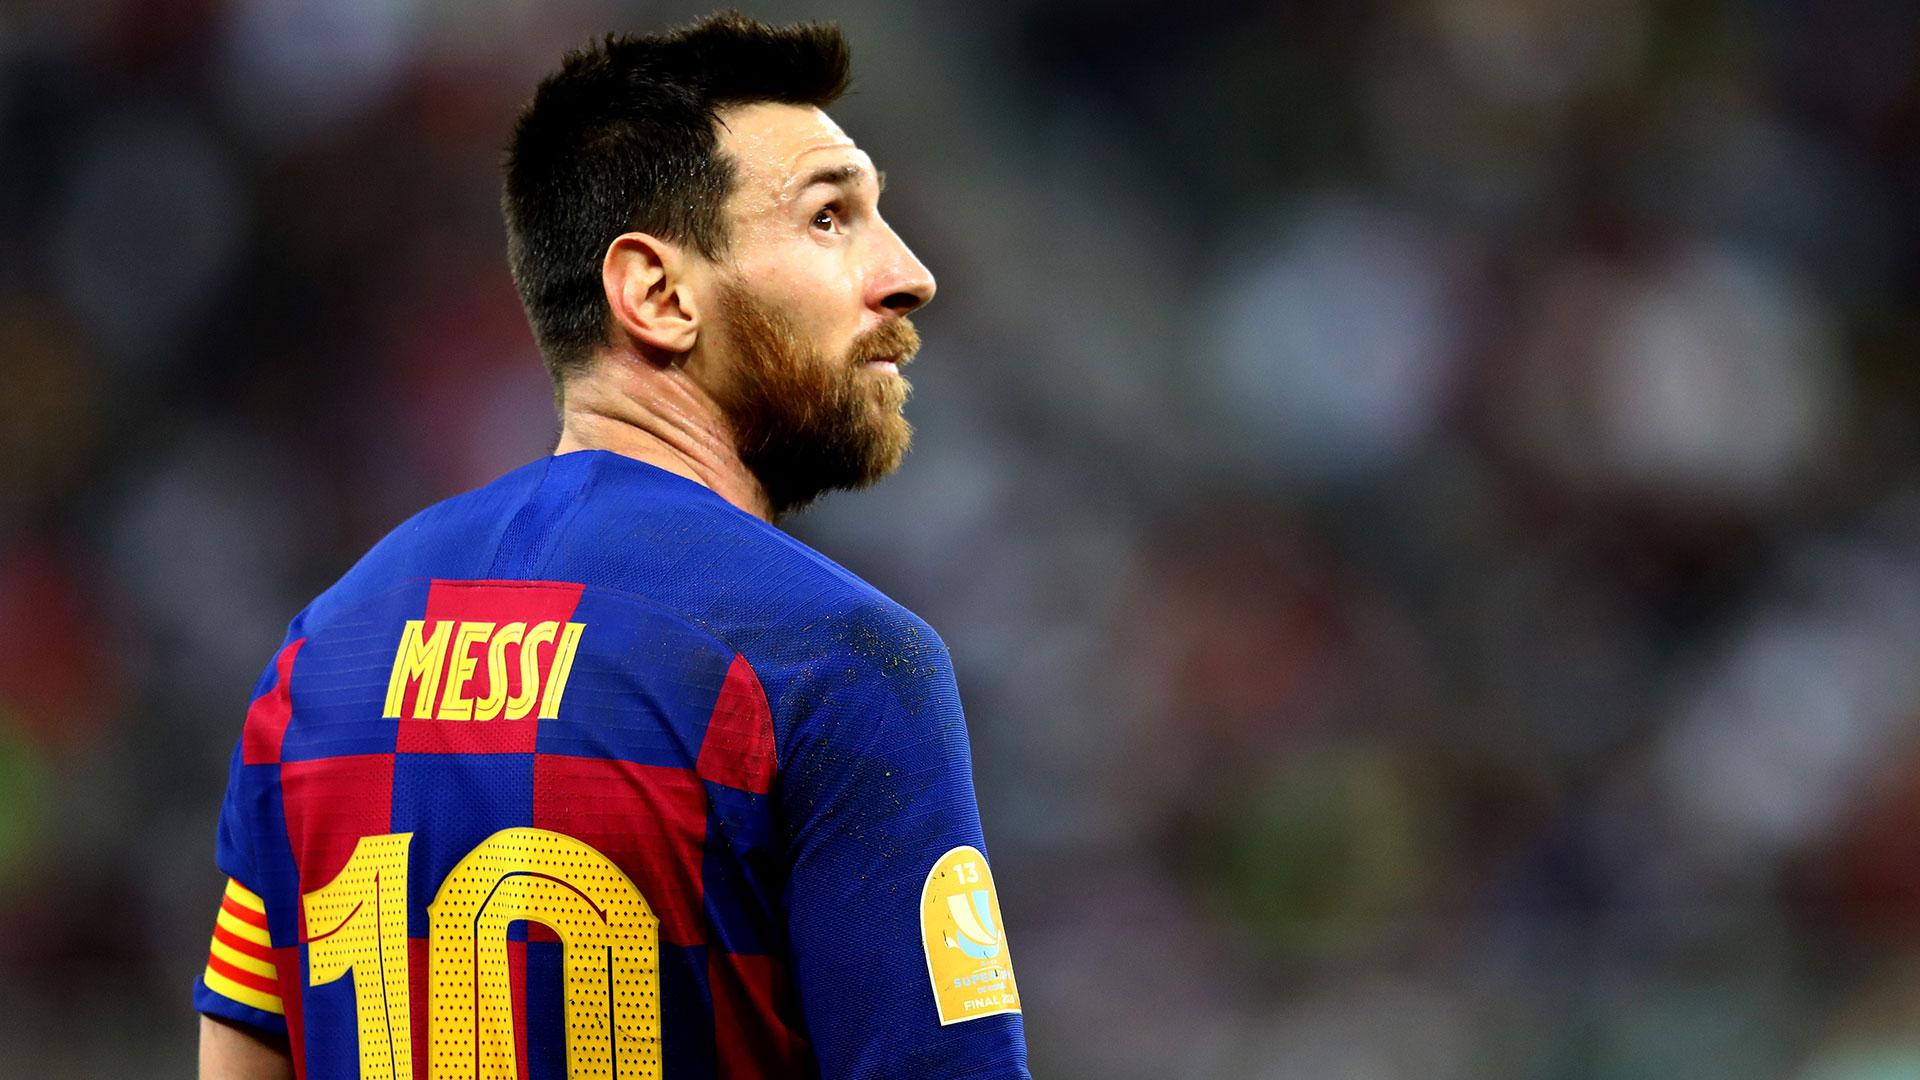 کشمکش بارسلونا و لیونل مسی/ جدایی آزاد یا بند فسخ 700 میلیون یورویی؟